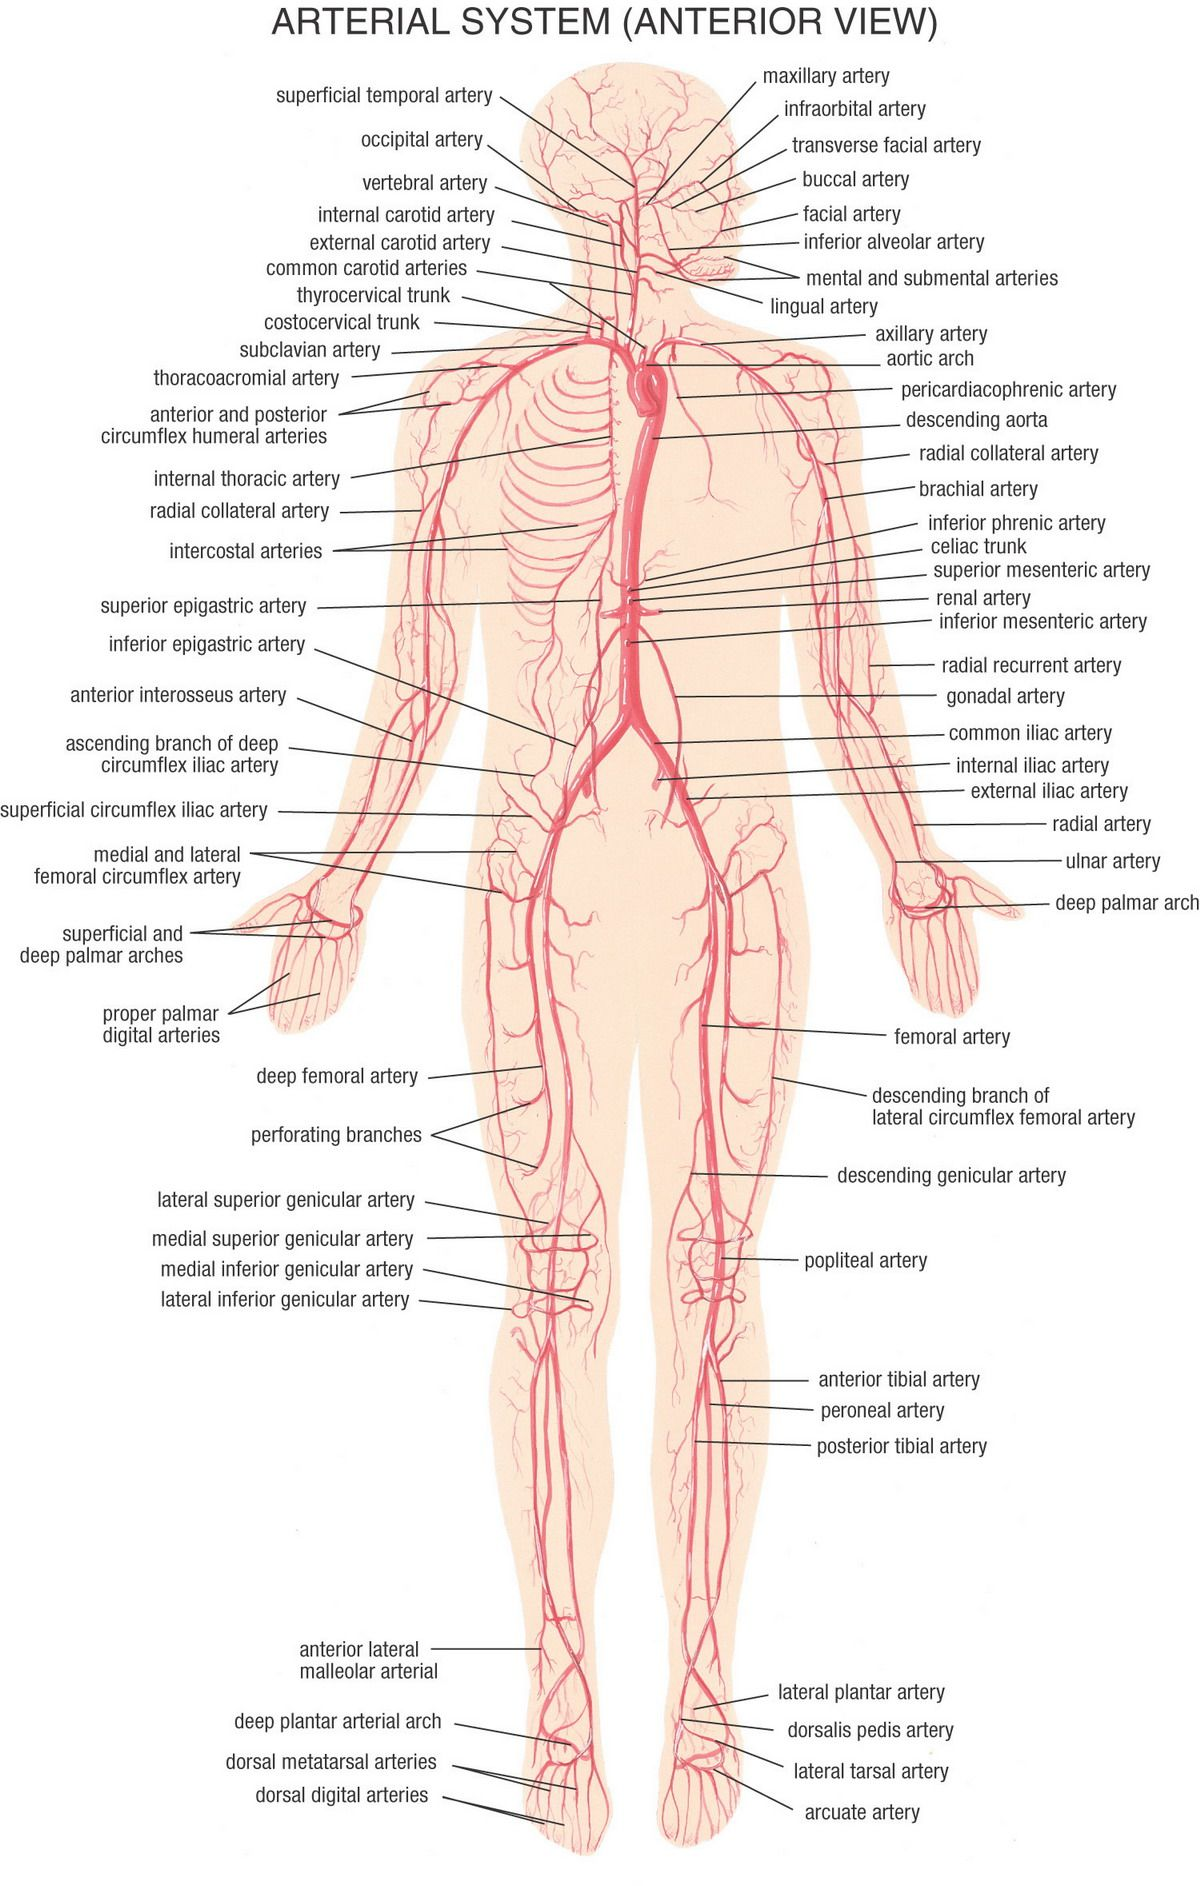 22_Arterial_System_Anterior_View.jpg 1,200×1,886 pixels | medical ...